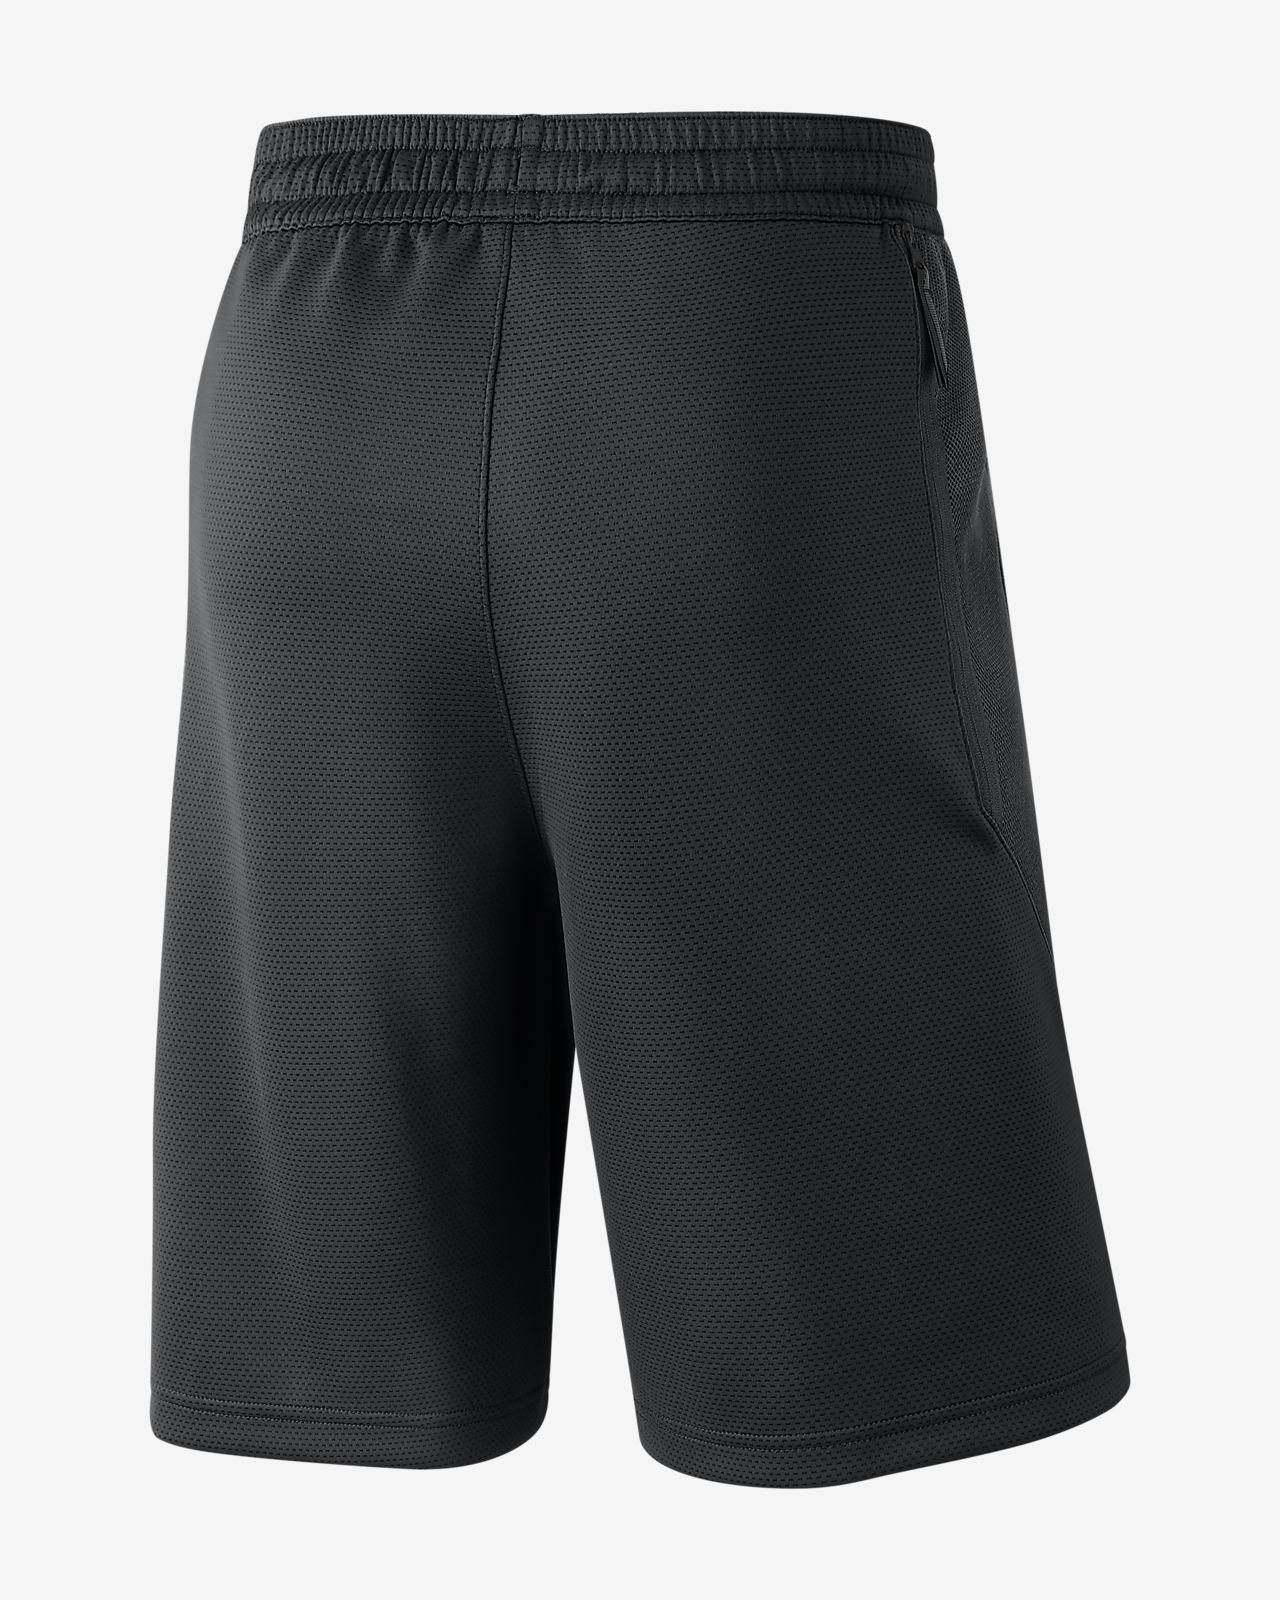 e3ee9afecfdf6 Chicago Bulls Nike Therma Flex Men's NBA Shorts. Nike.com AU